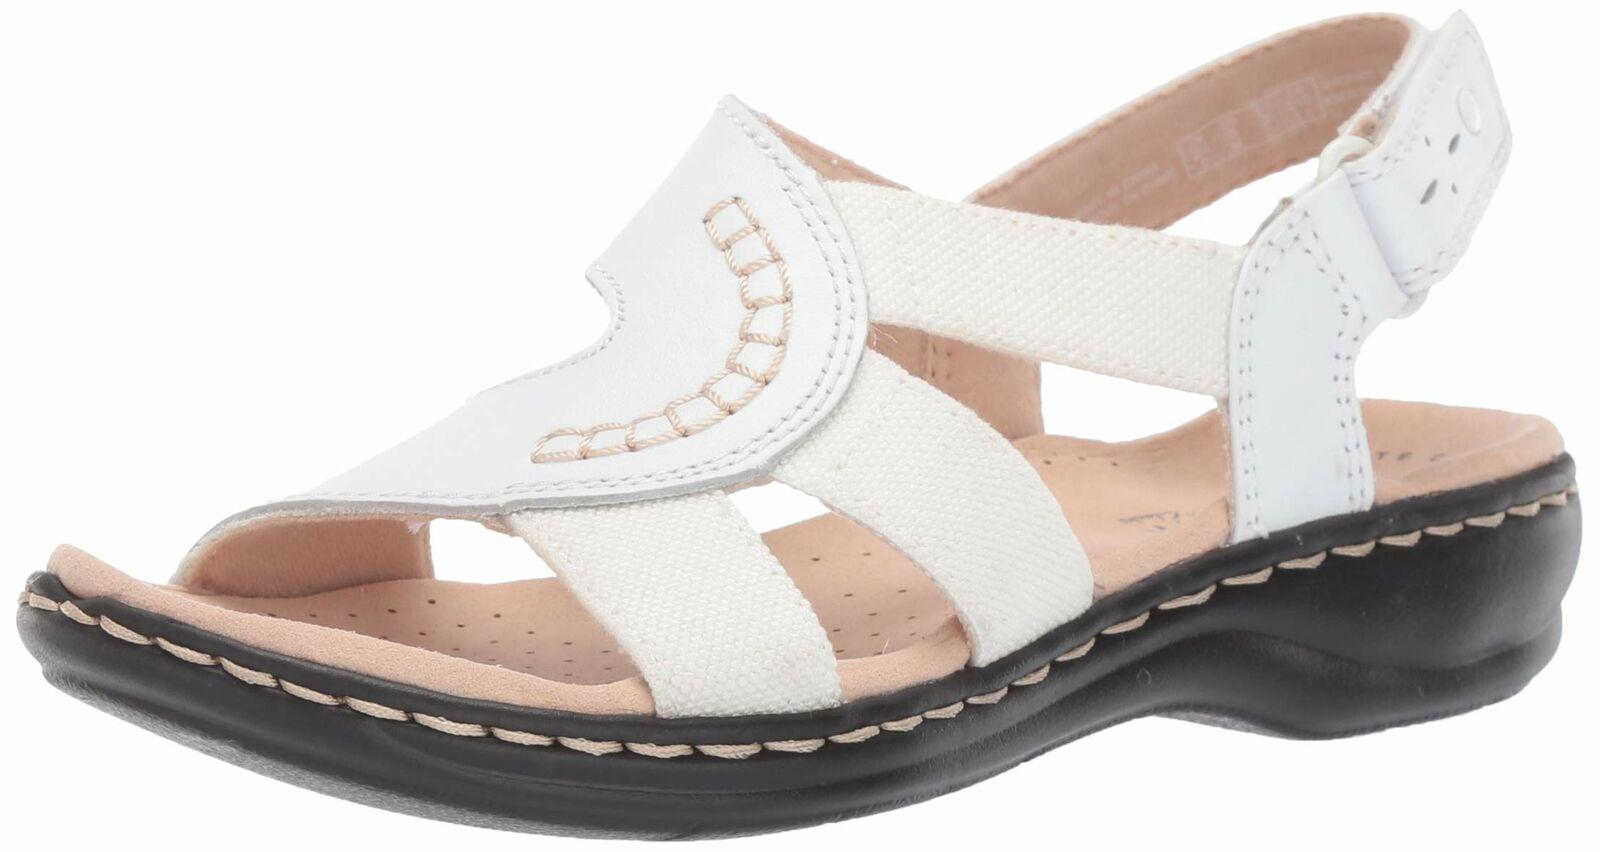 Clarks 26140781: Women's Leisa Joy White Leather/Textile Combo Sandal